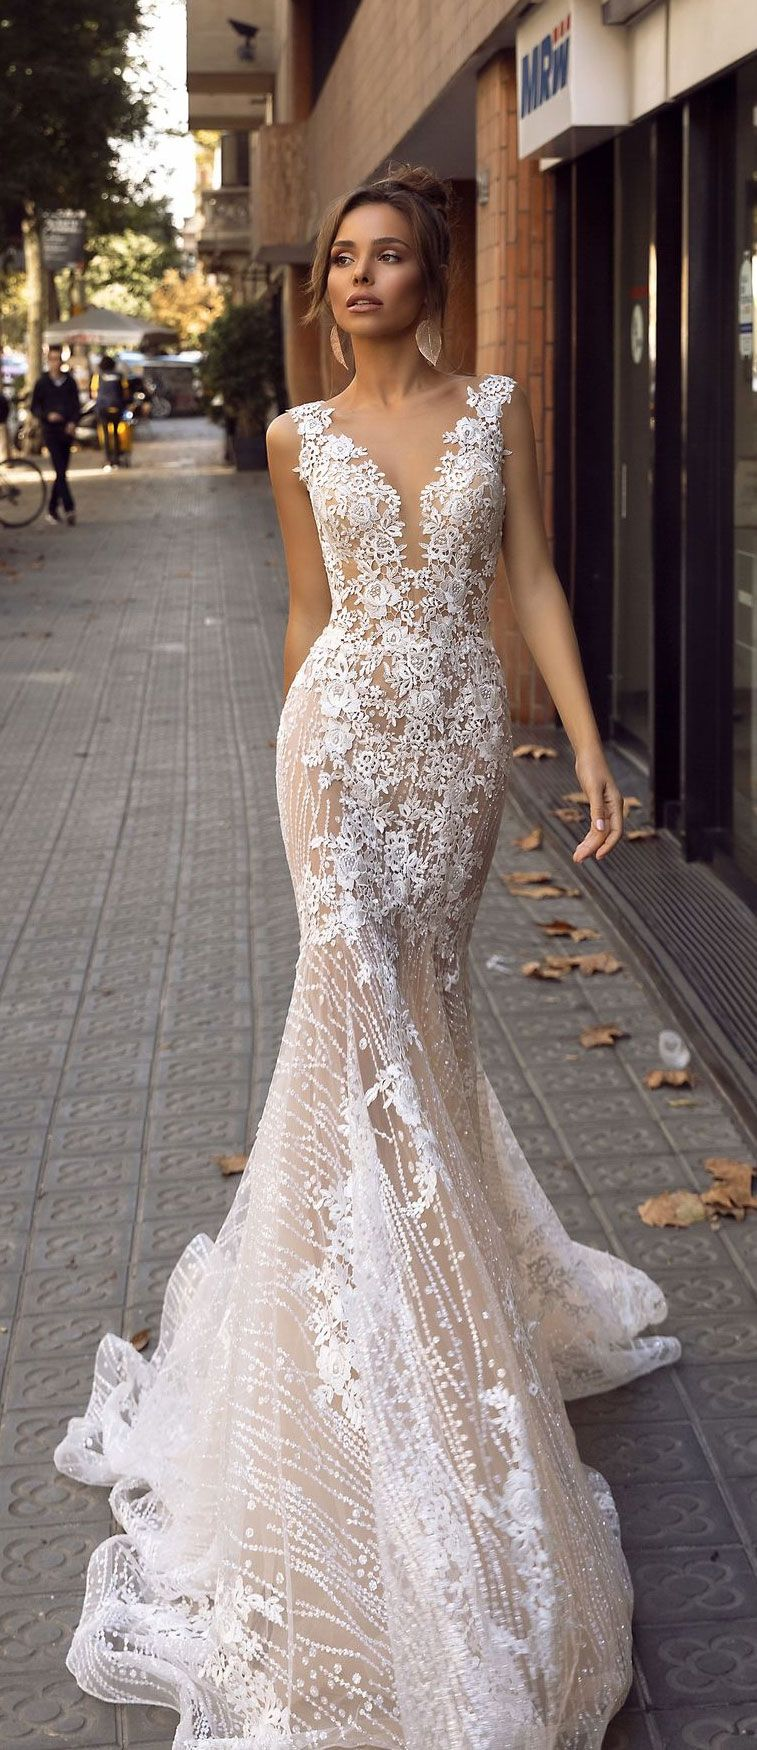 Beautiful wedding dress inspiration - Wedding Dresses, Sleeveless mermaid wedding gown, #bridalgown #weddinggown #weddingdress #bridedress